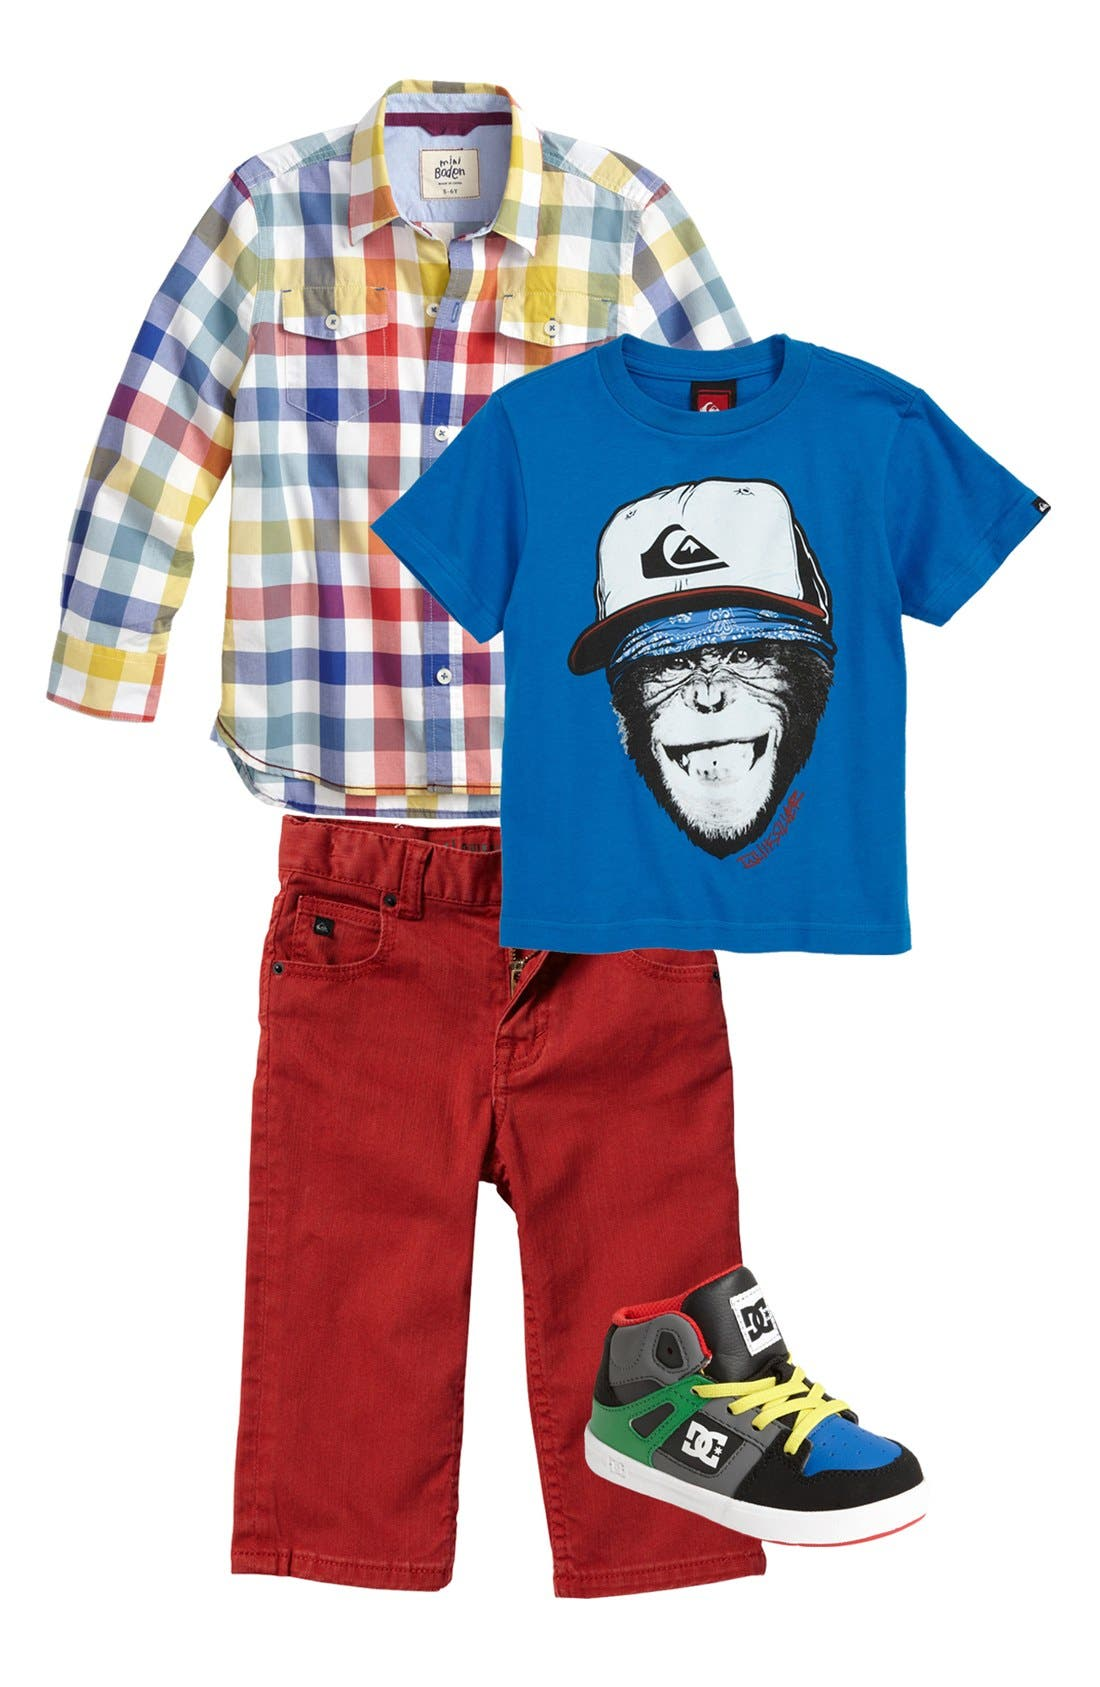 Main Image - Mini Boden Woven Shirt & Quiksilver T-Shirt & Jeans (Toddler)